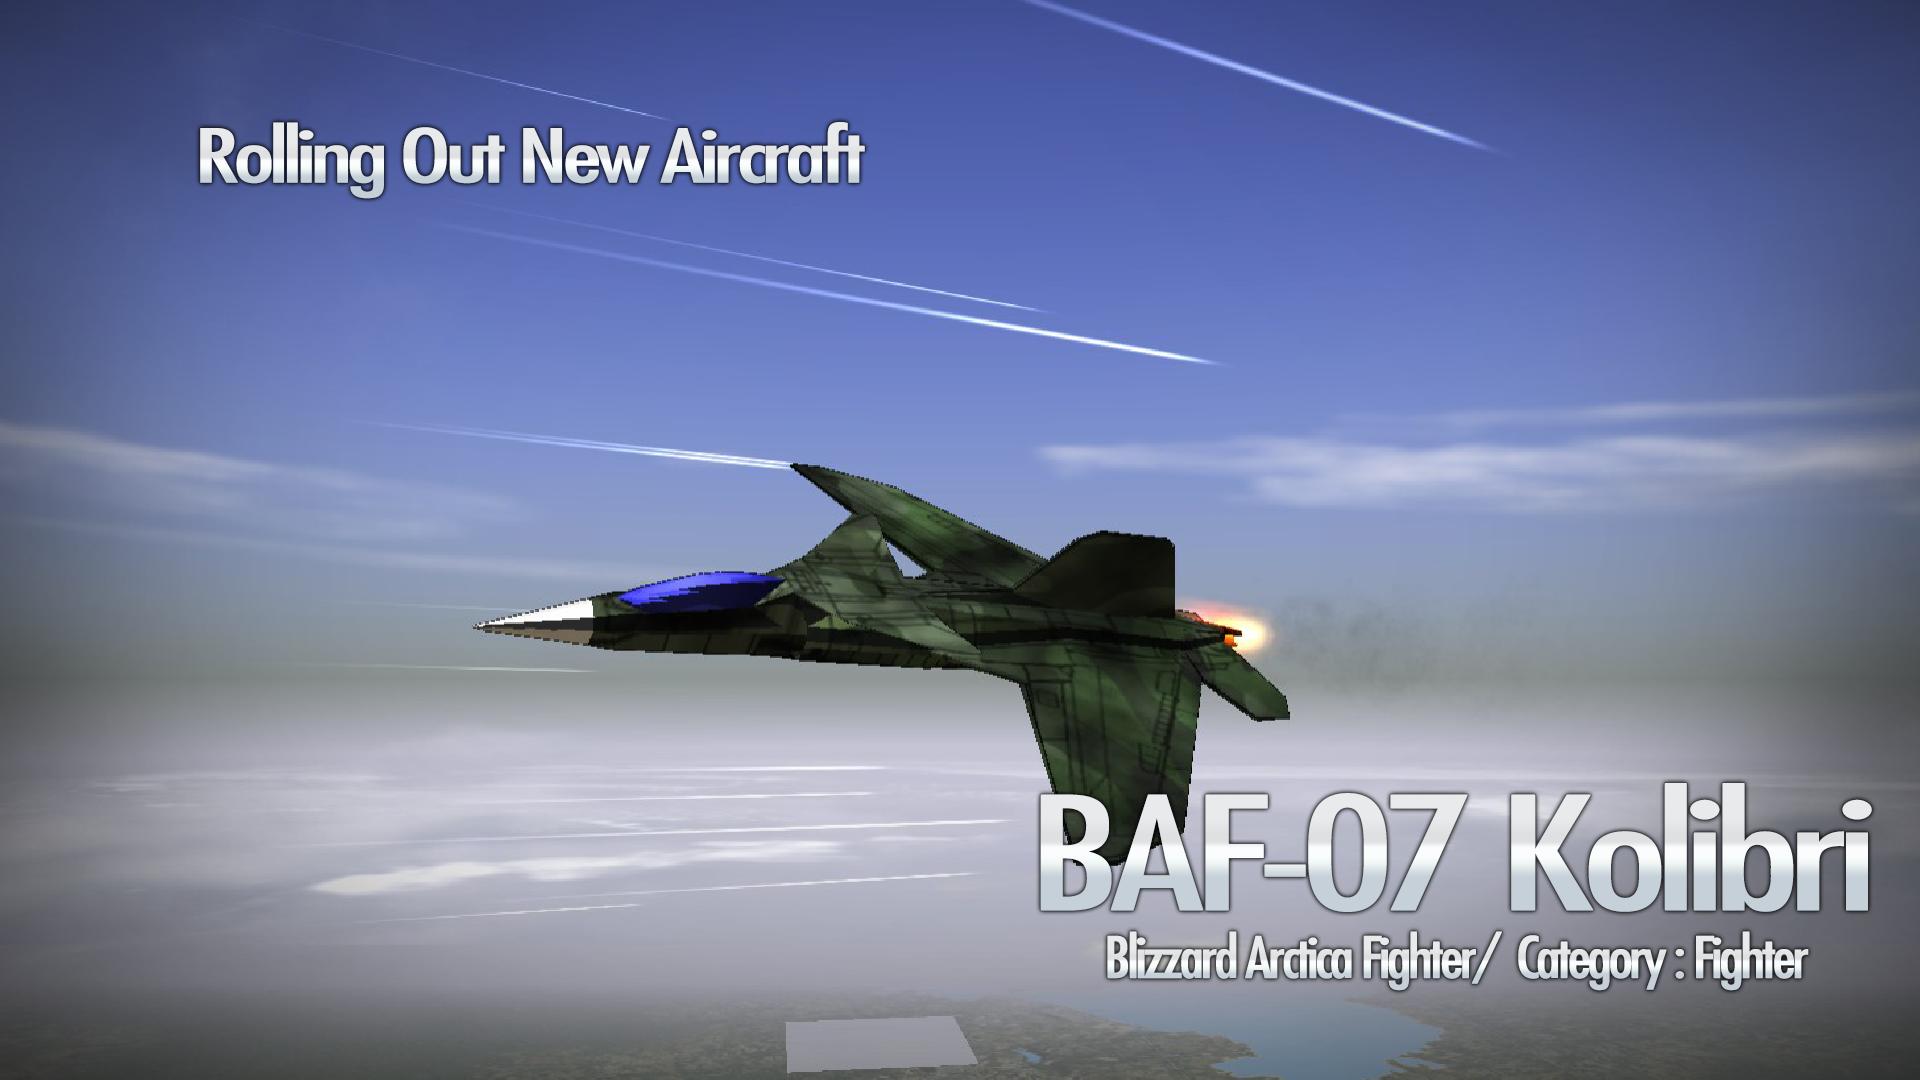 BAF 07